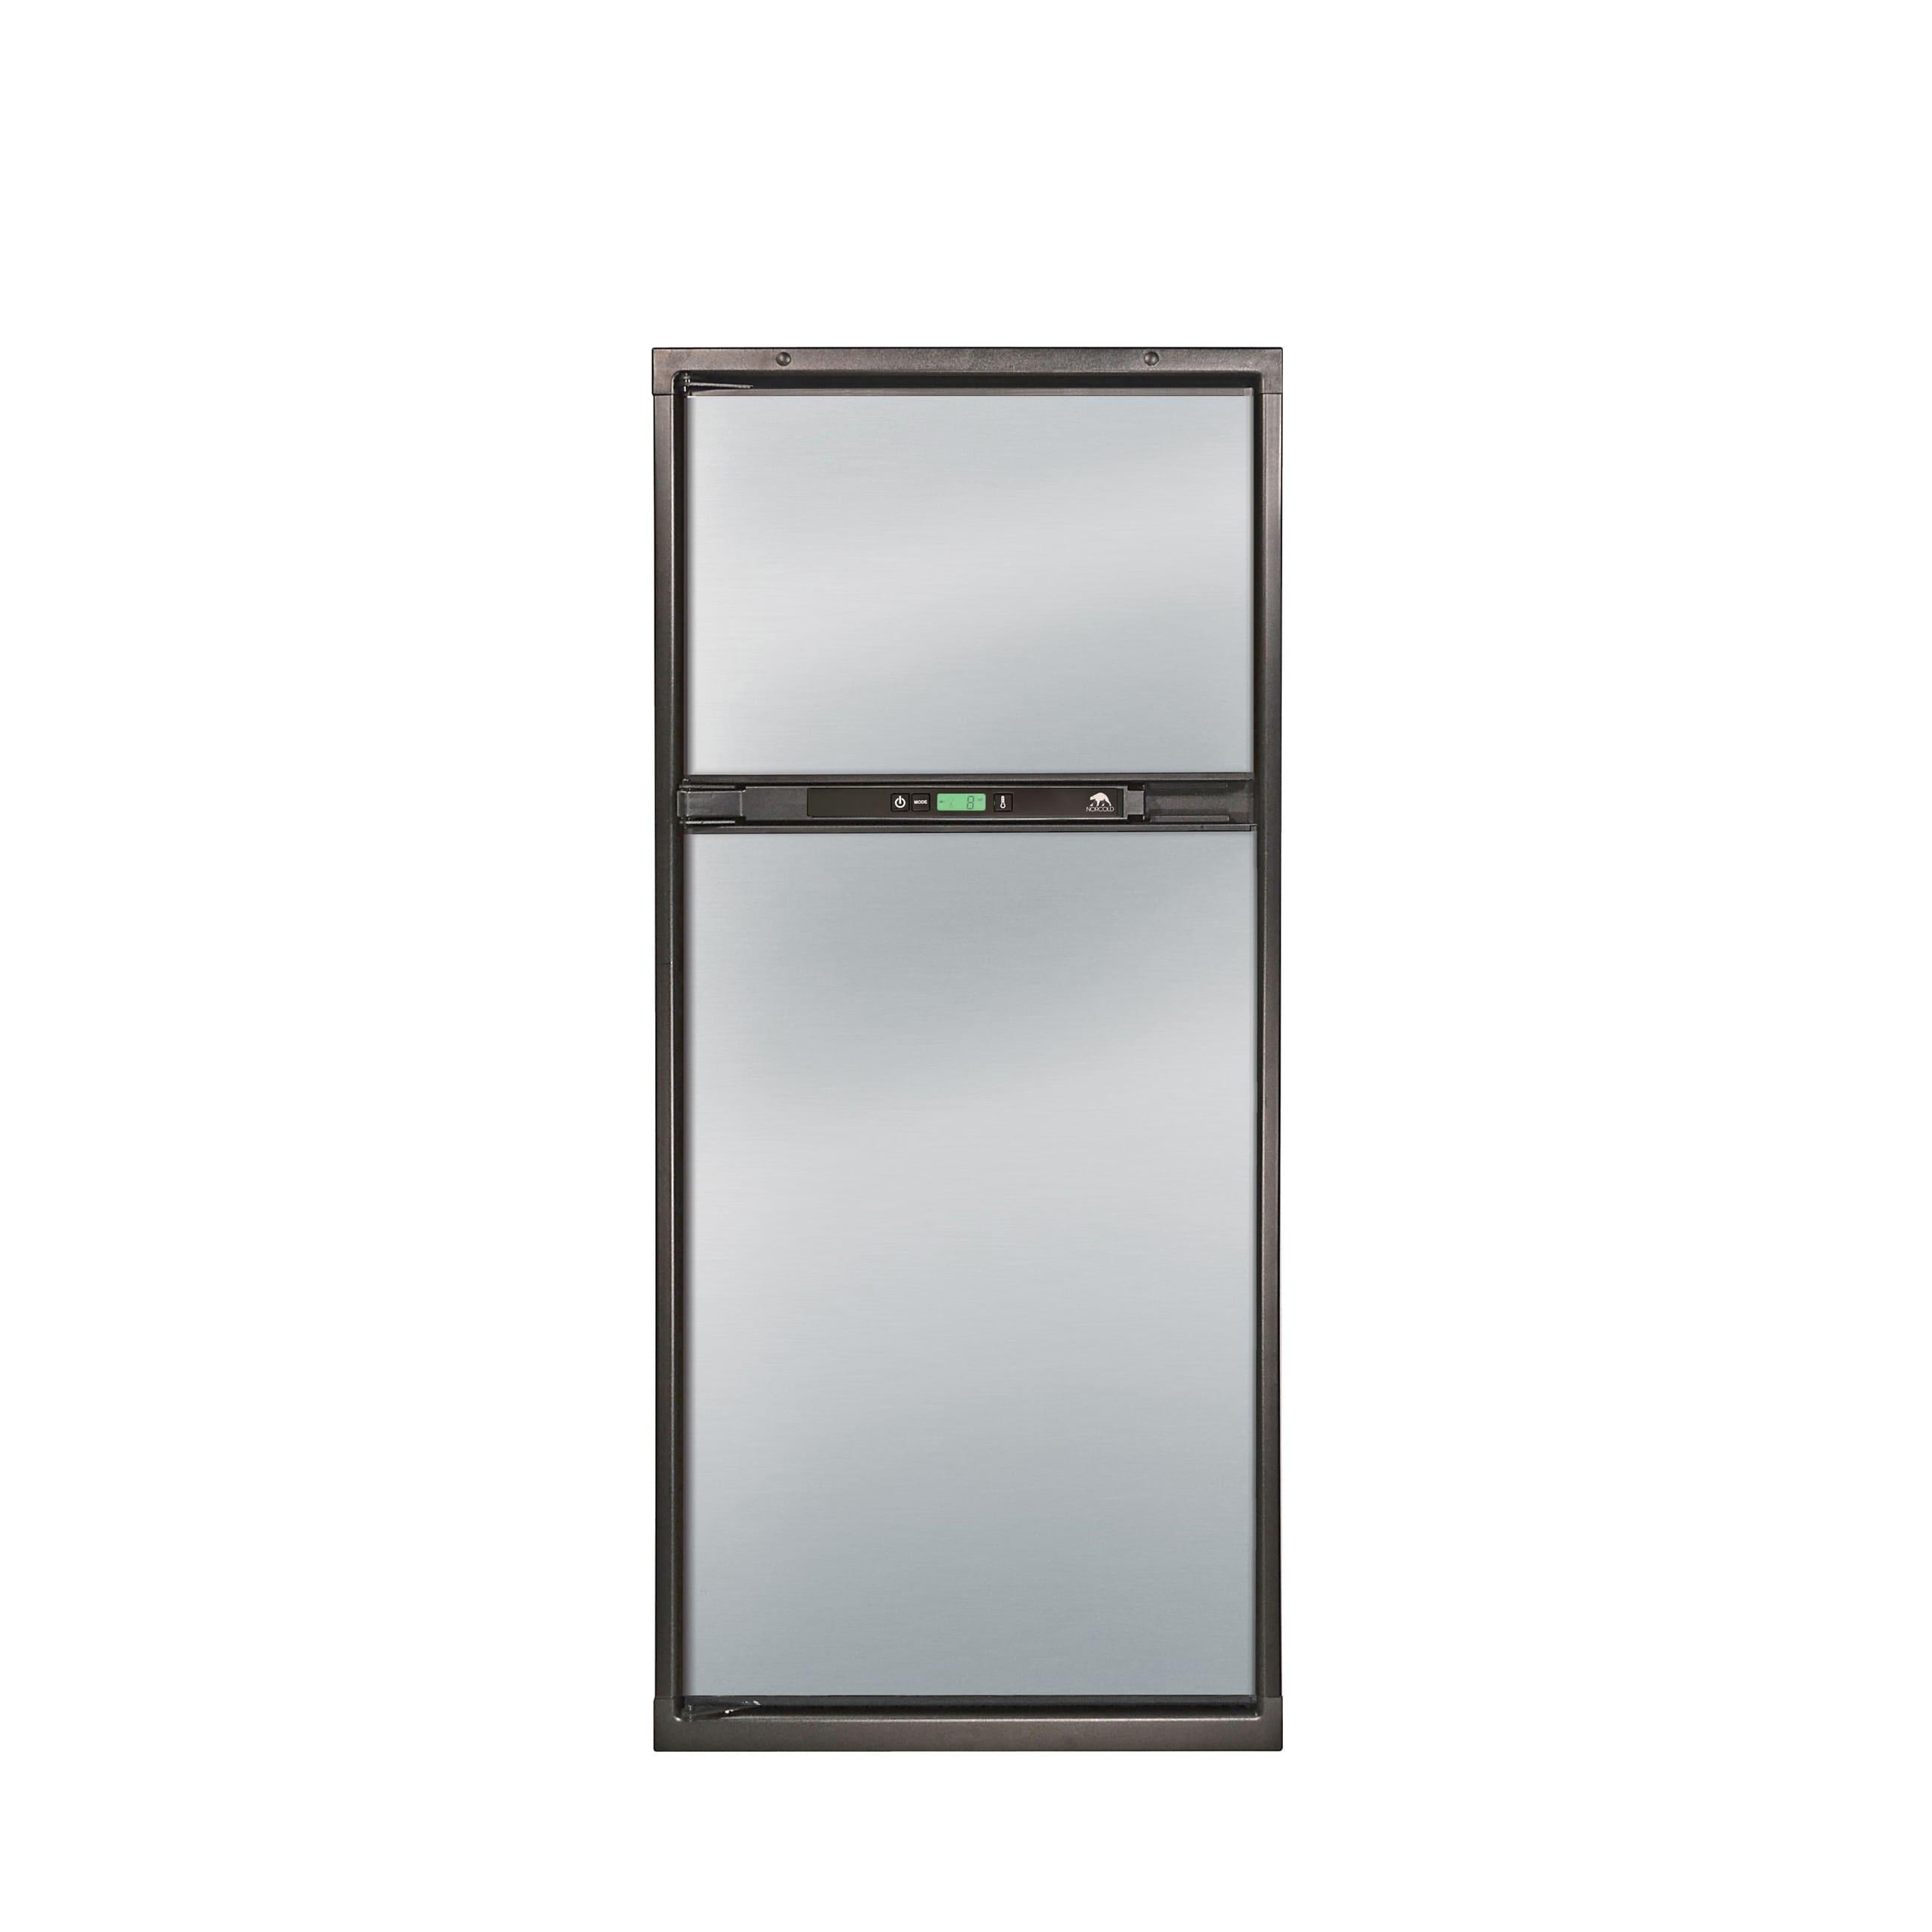 The NX641 RV refrigerator series - Superior quality inside